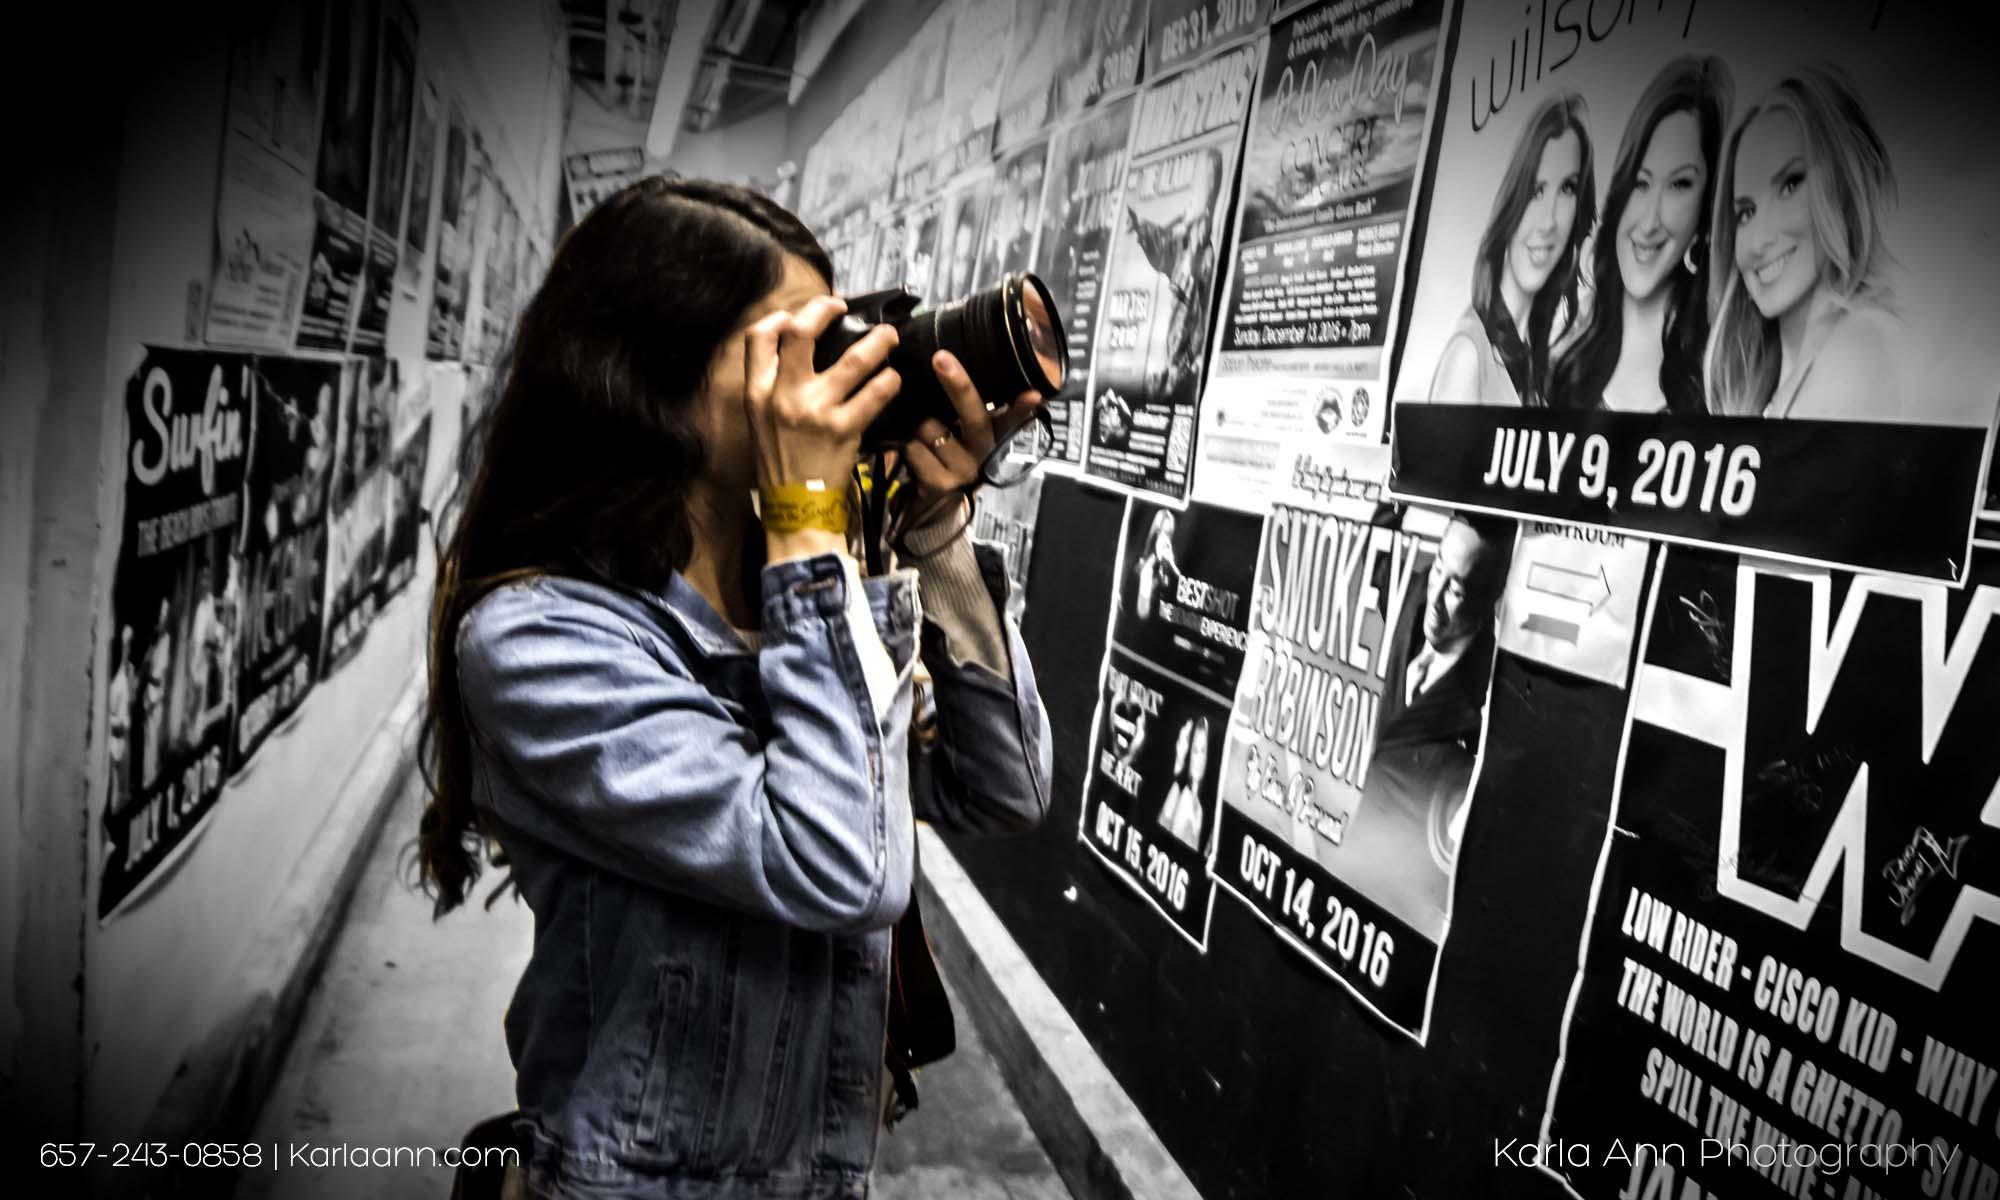 Karla Ann Photography